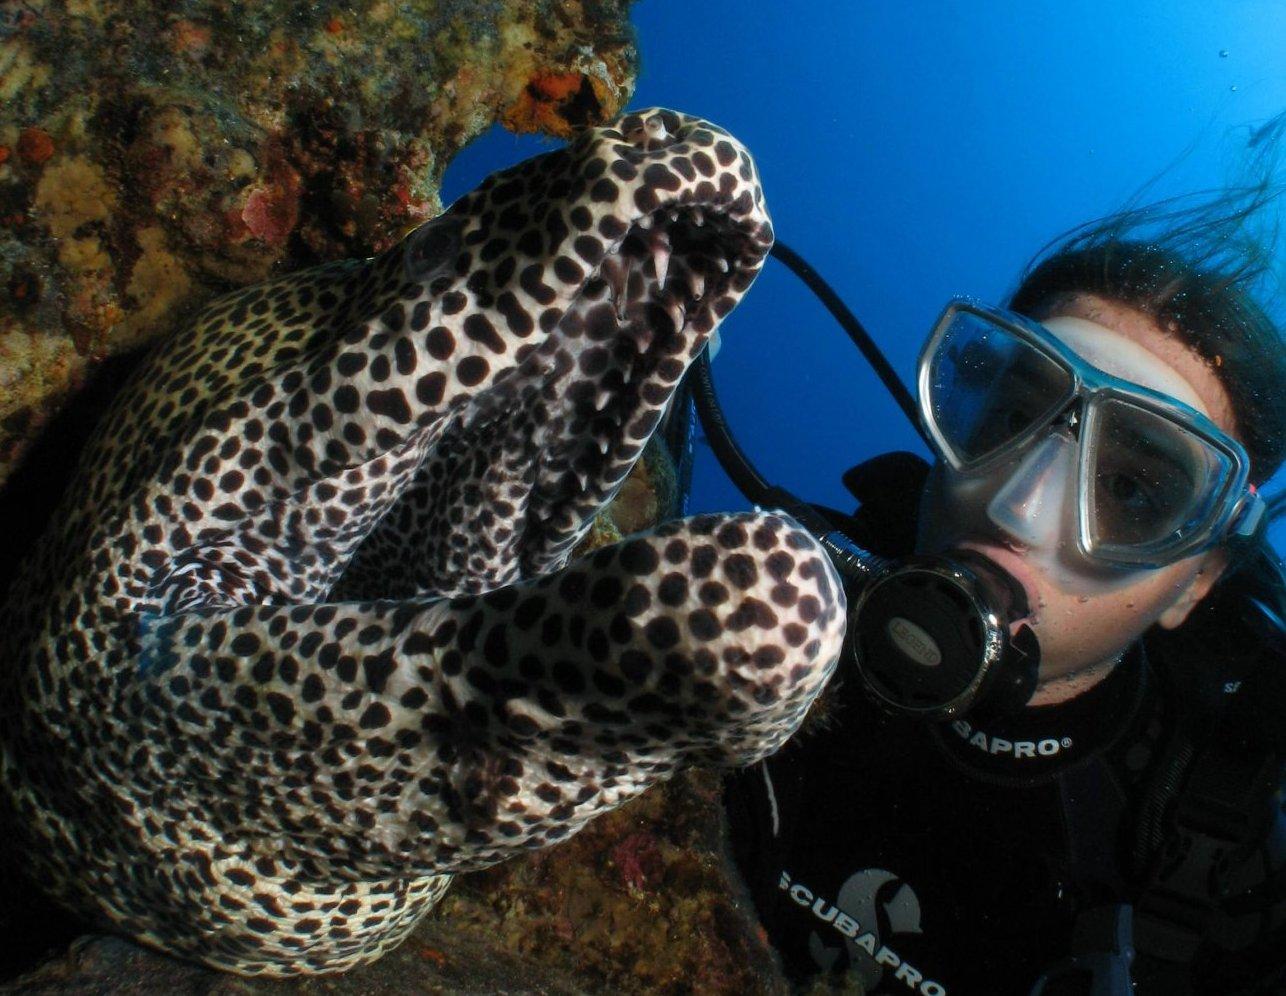 Galerie de photos sous marine Bilder Mauritius Unterwasser SeaUrchin UW Pics Mauritius SeaUrchin Diving Center Gallery